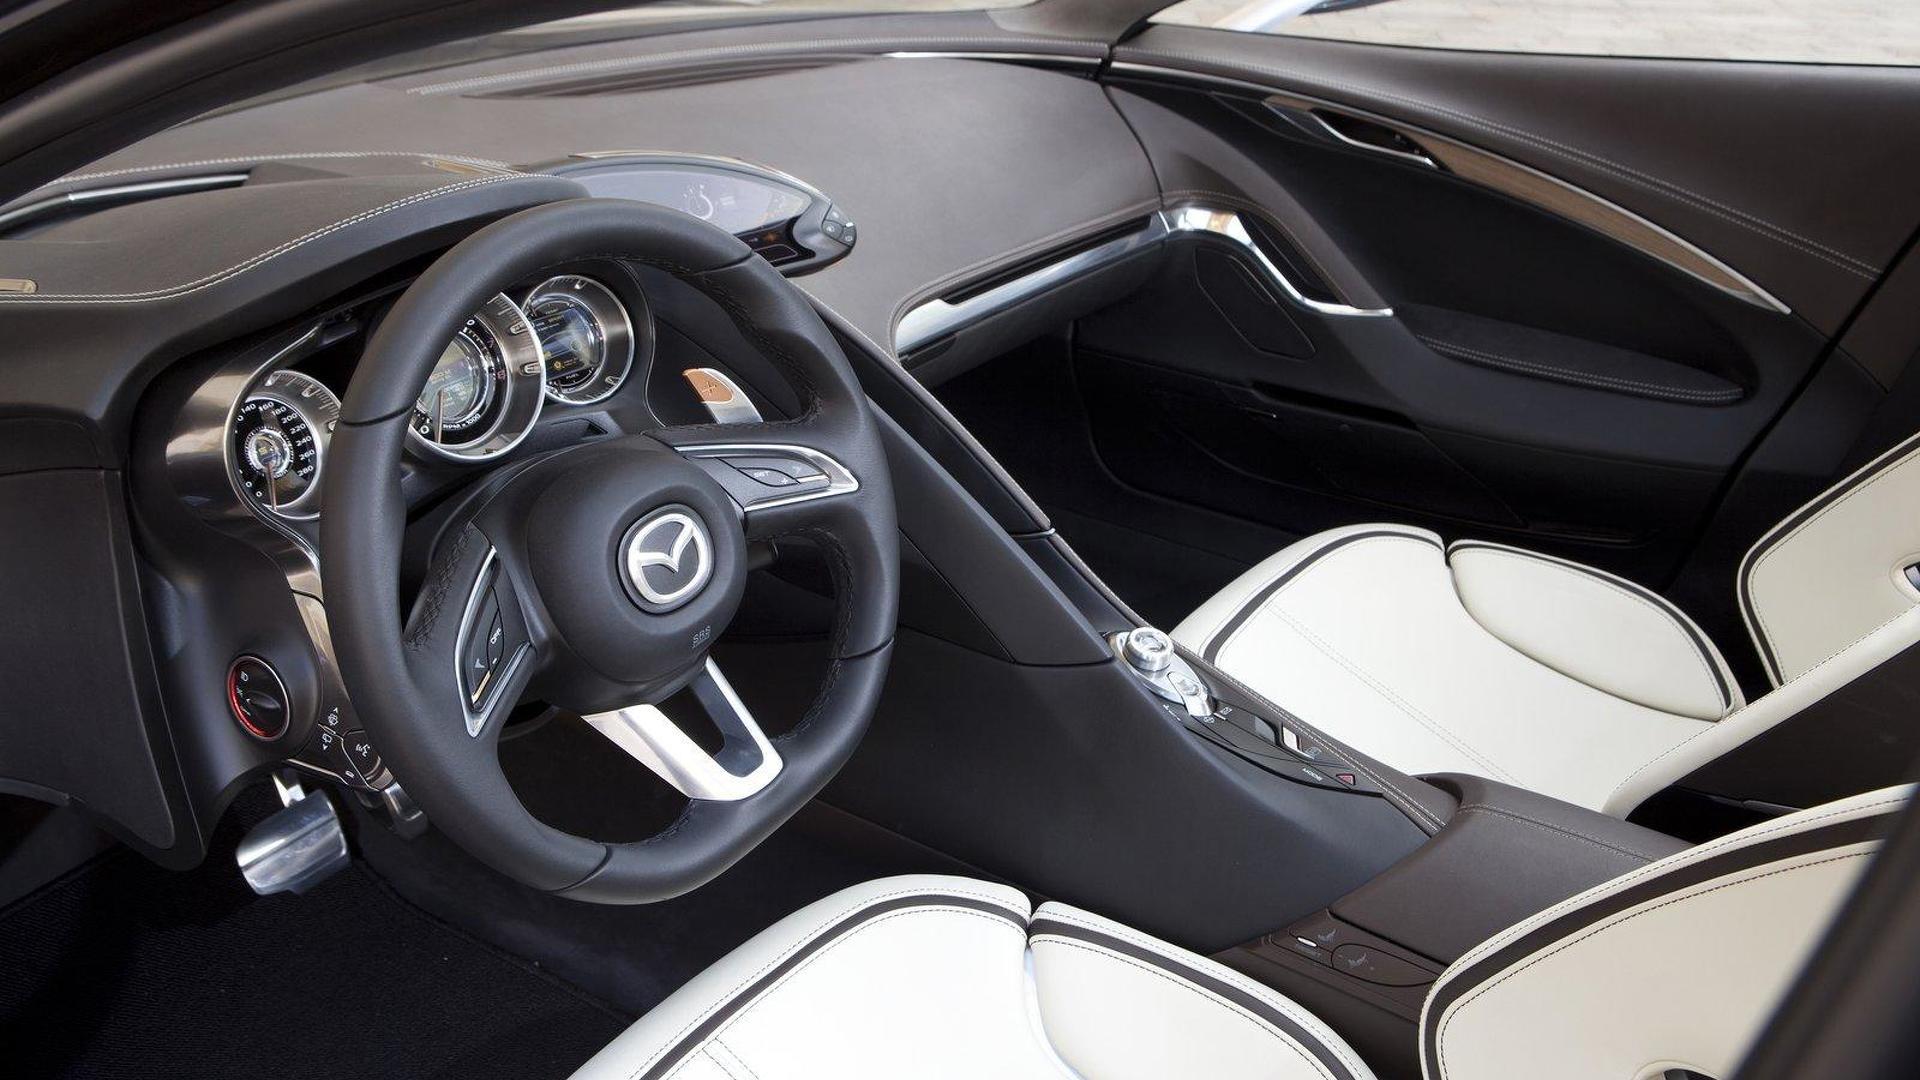 Kelebihan Mazda Shinari Spesifikasi